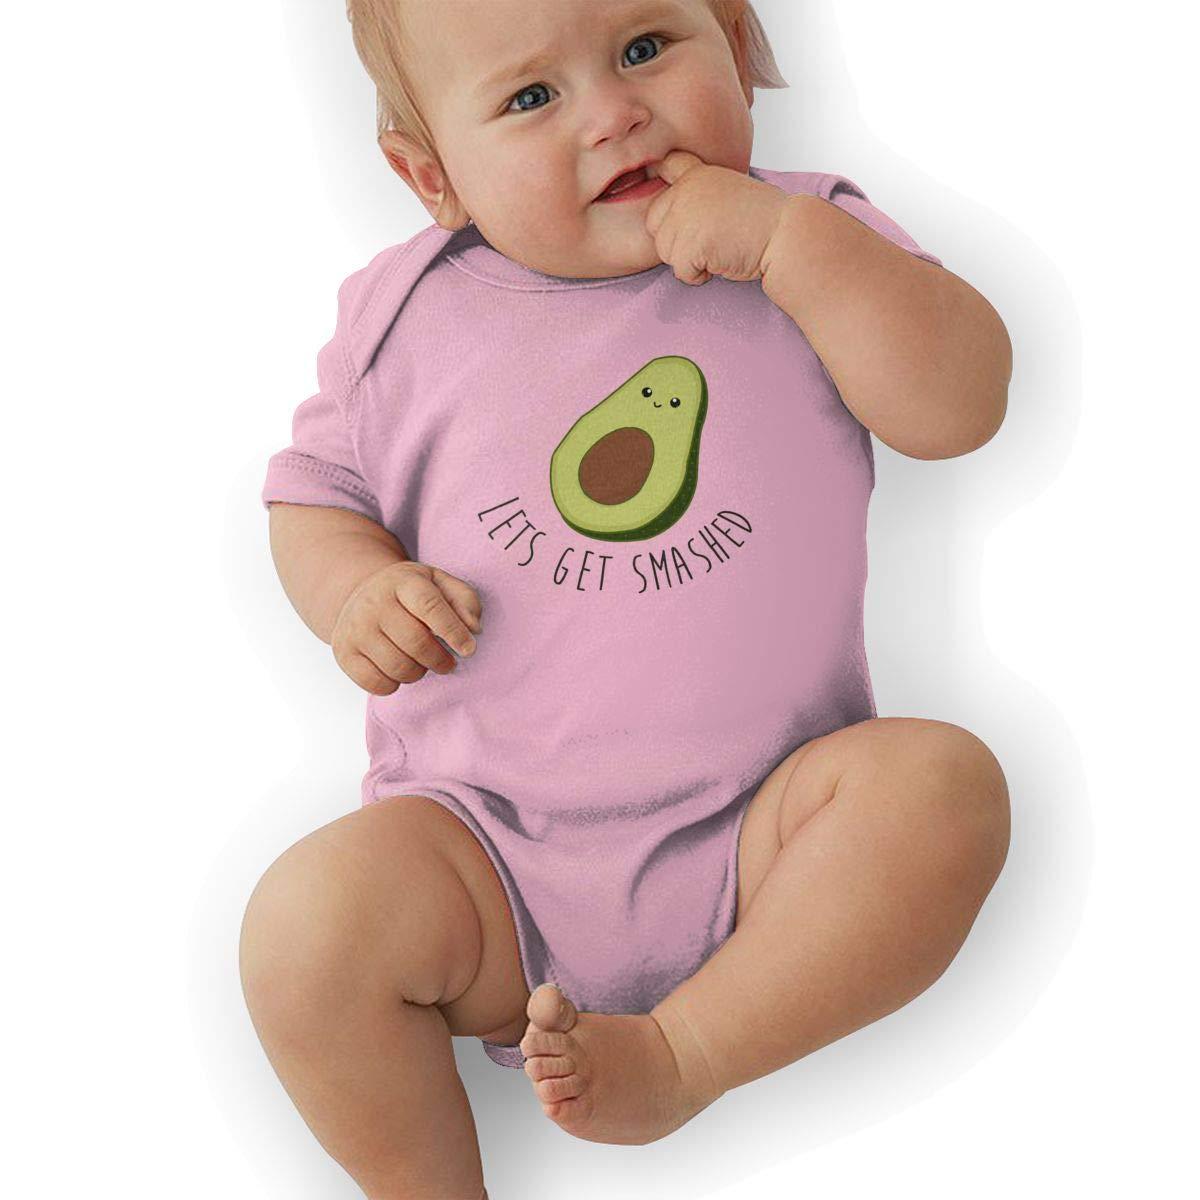 Toddler Baby Boys Bodysuit Short-Sleeve Onesie Lets Get Smashed Print Rompers Autumn Pajamas